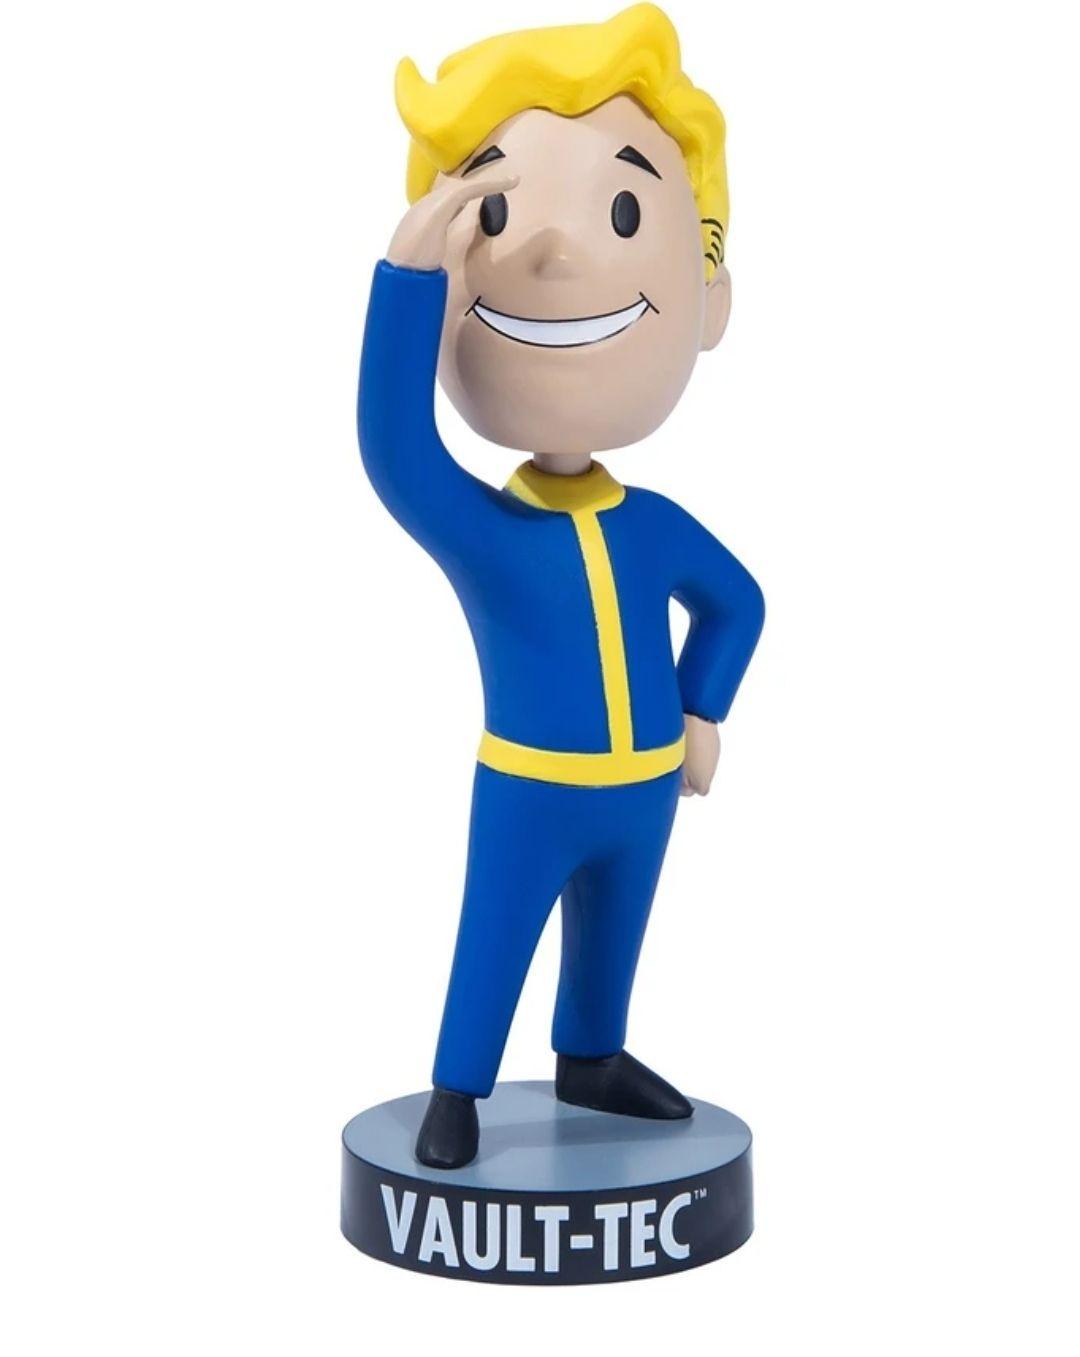 Vault Boy Perception Bobble Head 99p + £4.99 delivery @ Game